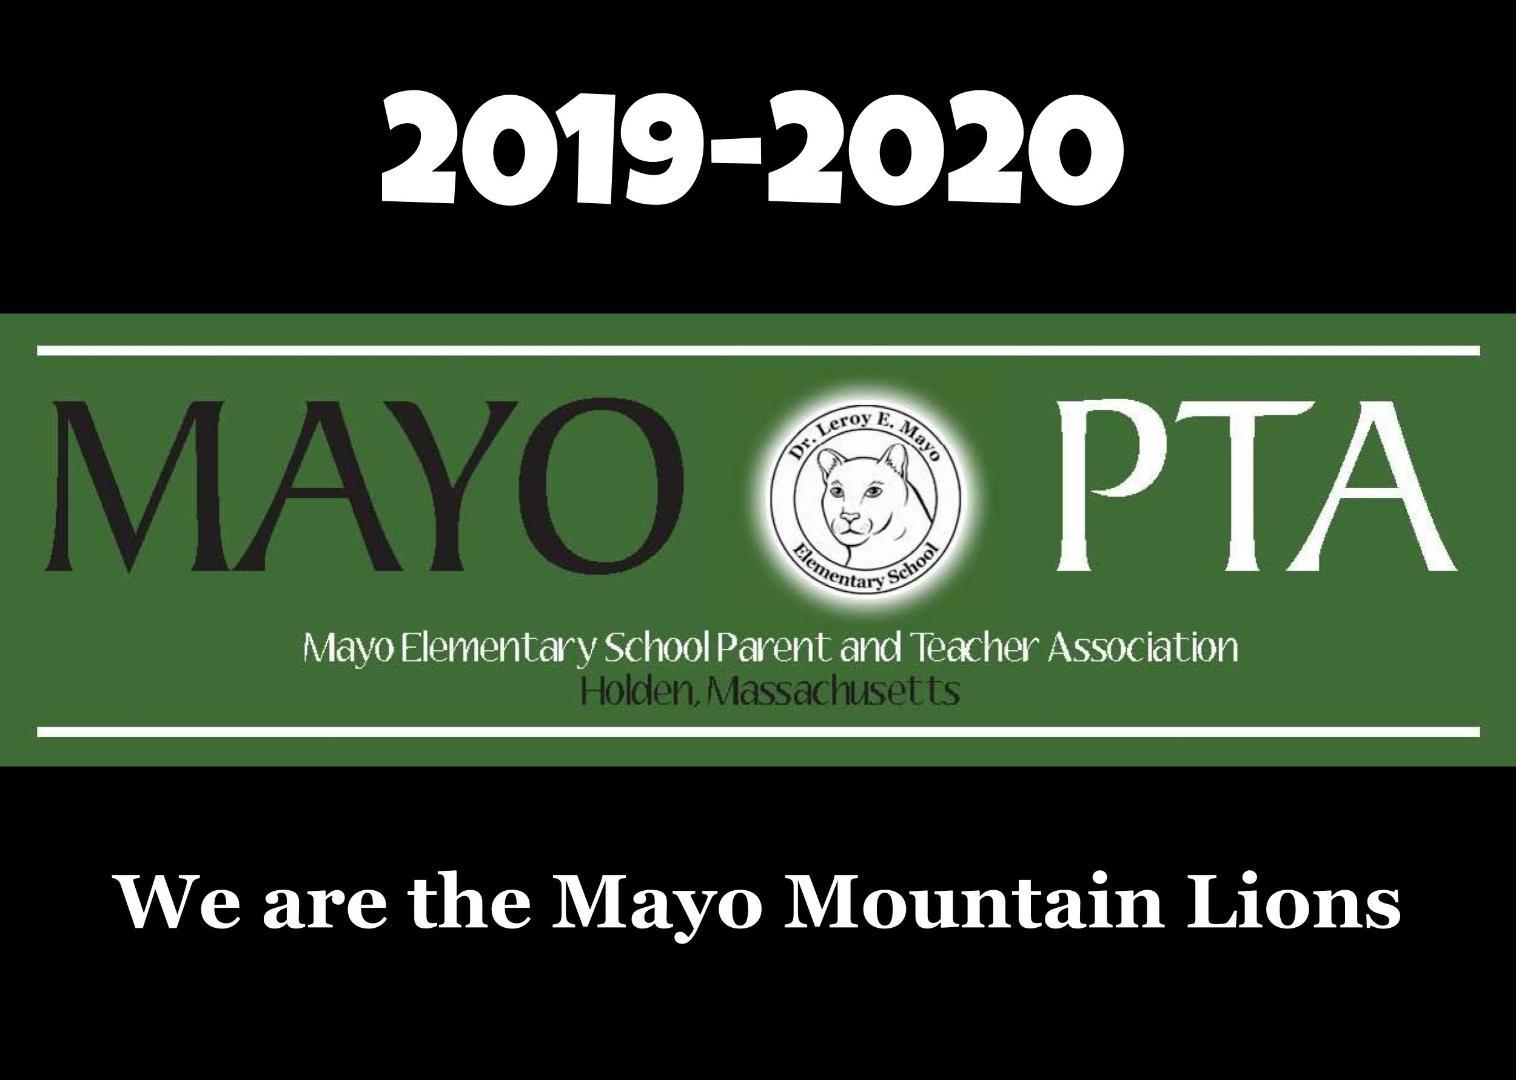 Leroy E. Mayo PTA